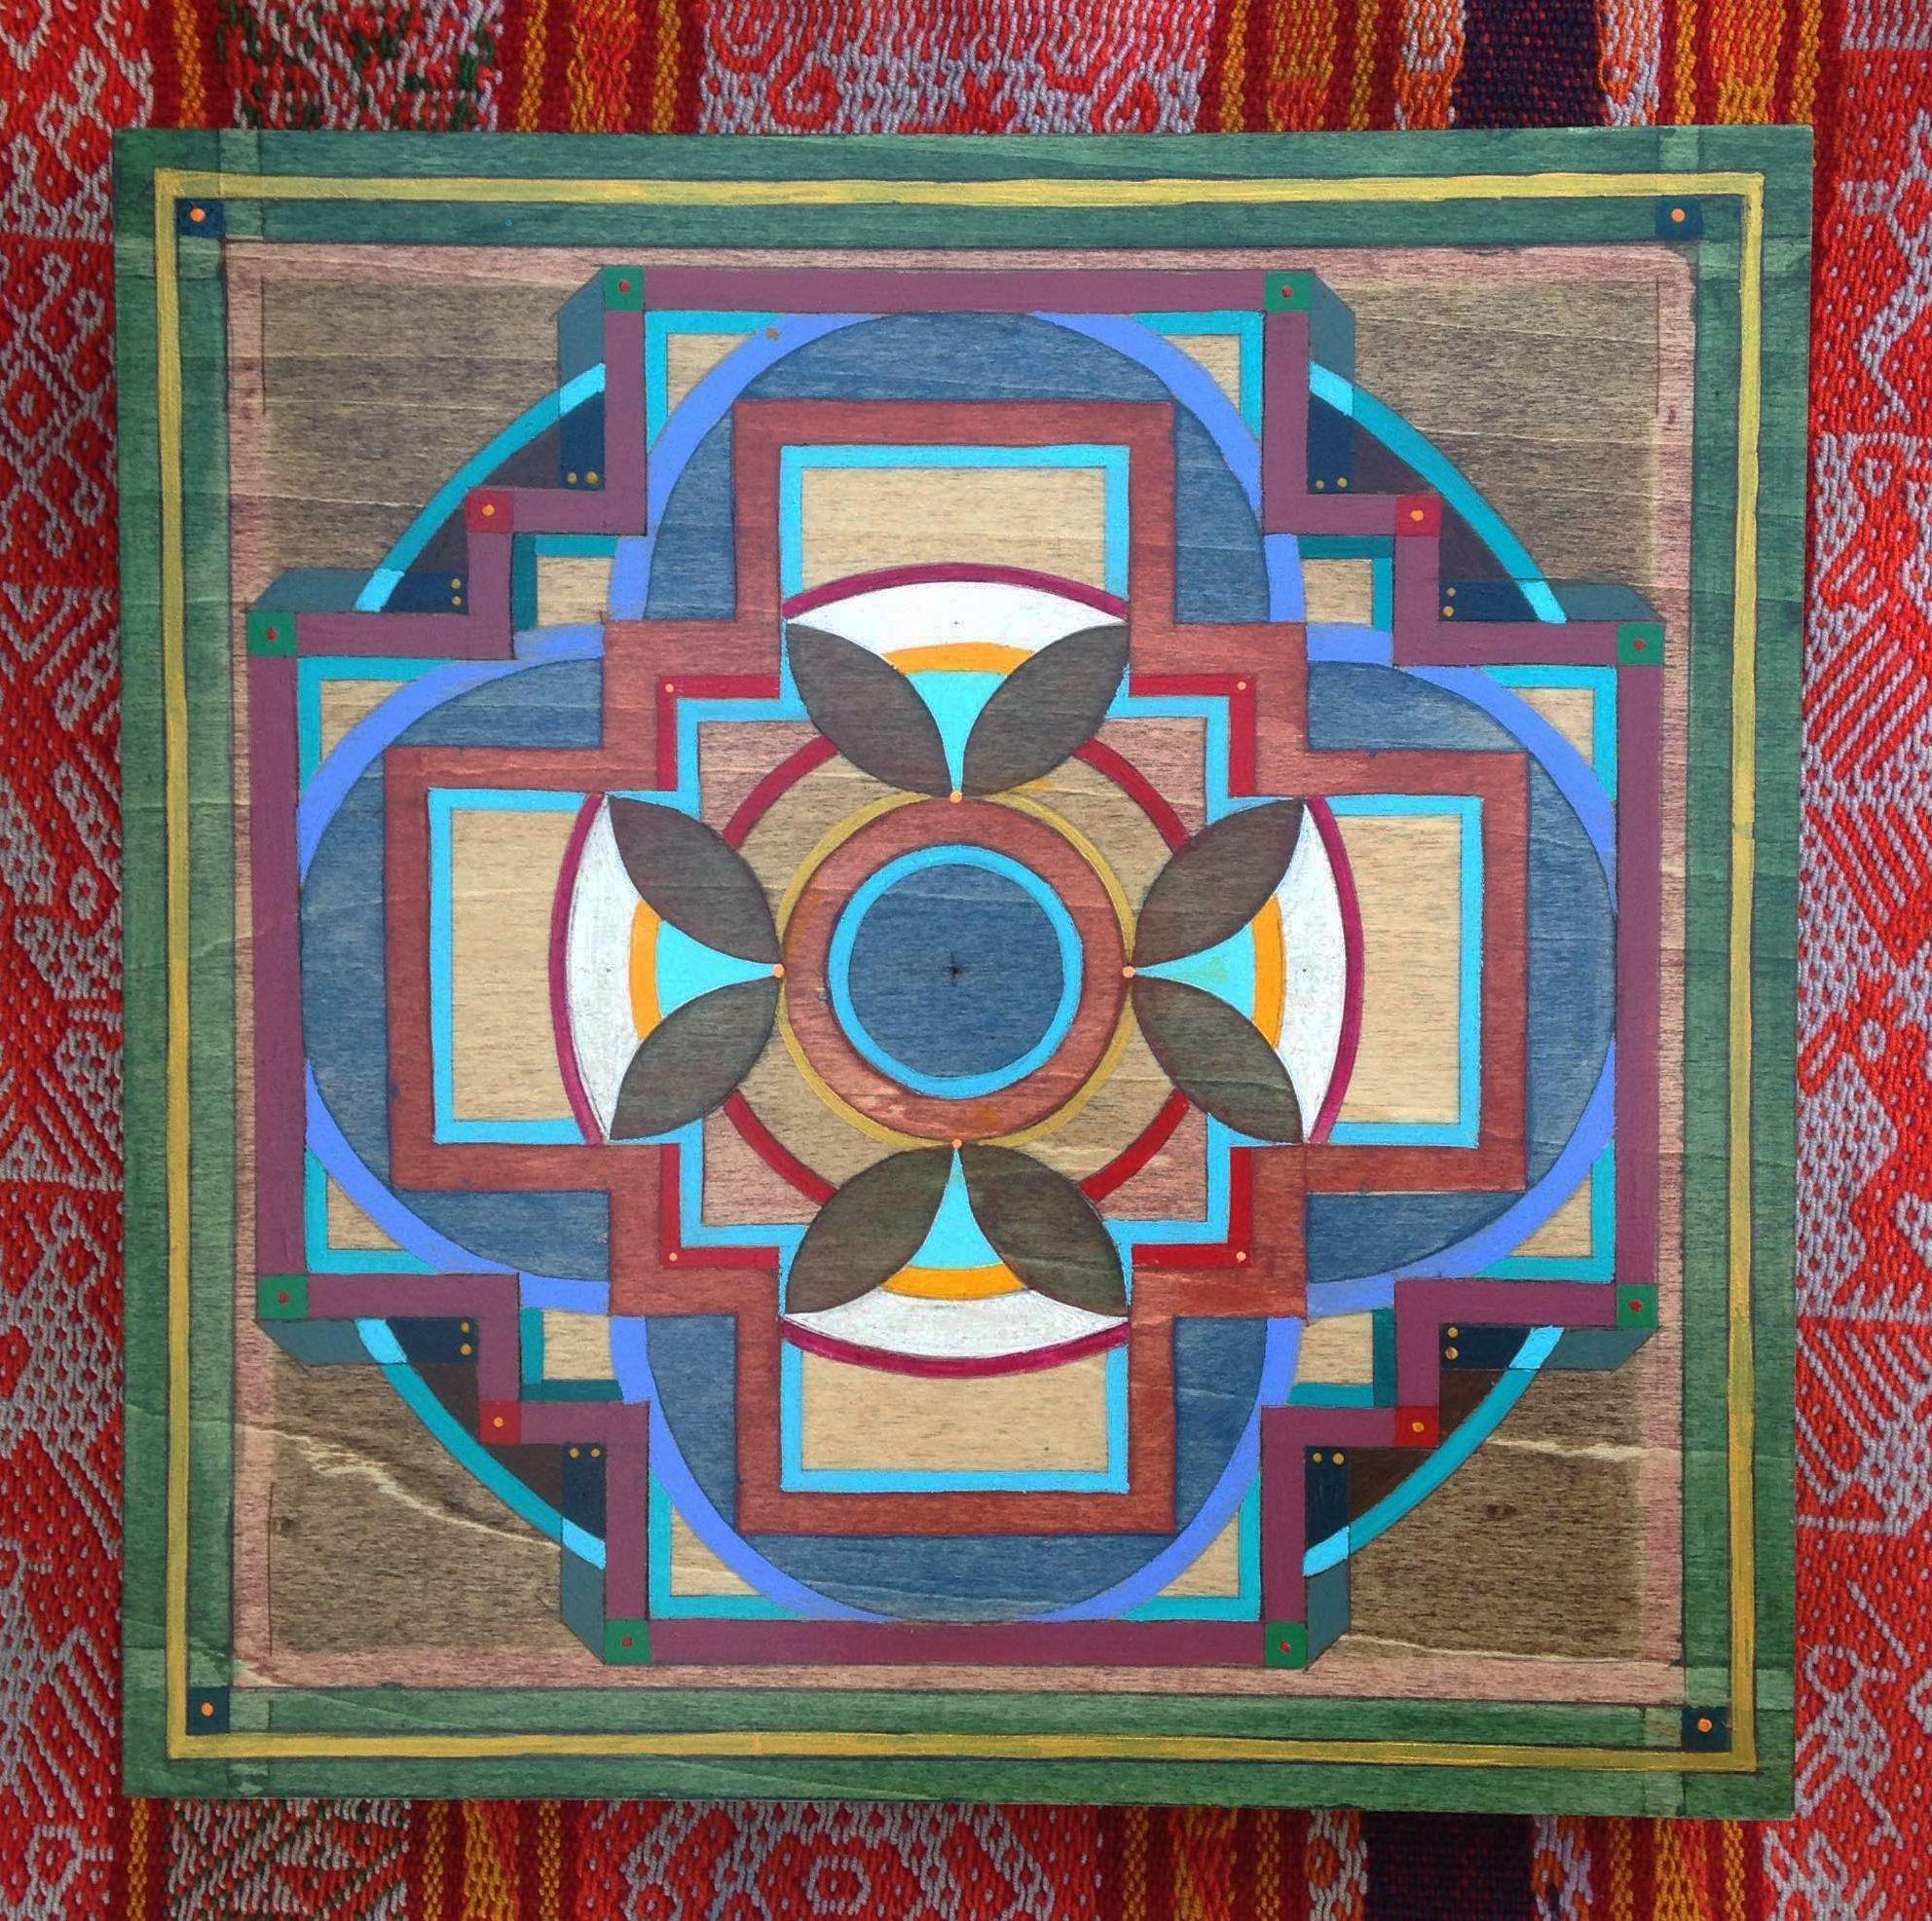 The chakana symbolizes for inca mythology what is known in other the chakana symbolizes for inca mythology what is known in other mythologies as the world biocorpaavc Gallery